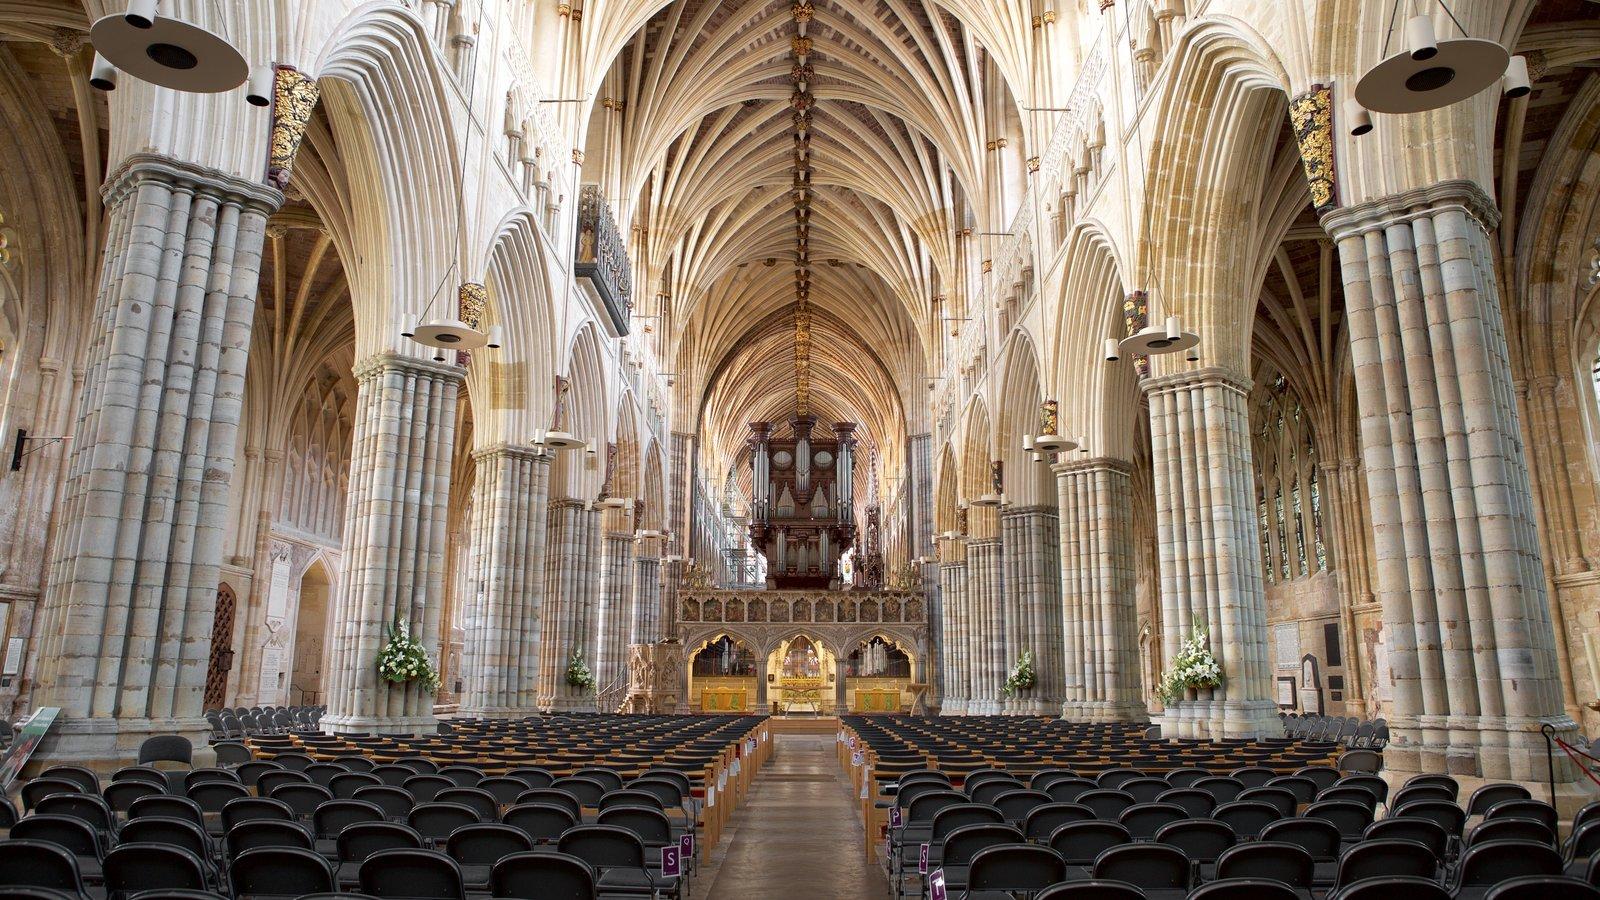 Le Symbolisme Chrétien - 19 eme siècle - Angleterre ( Images) 153918-Exeter-Cathedral